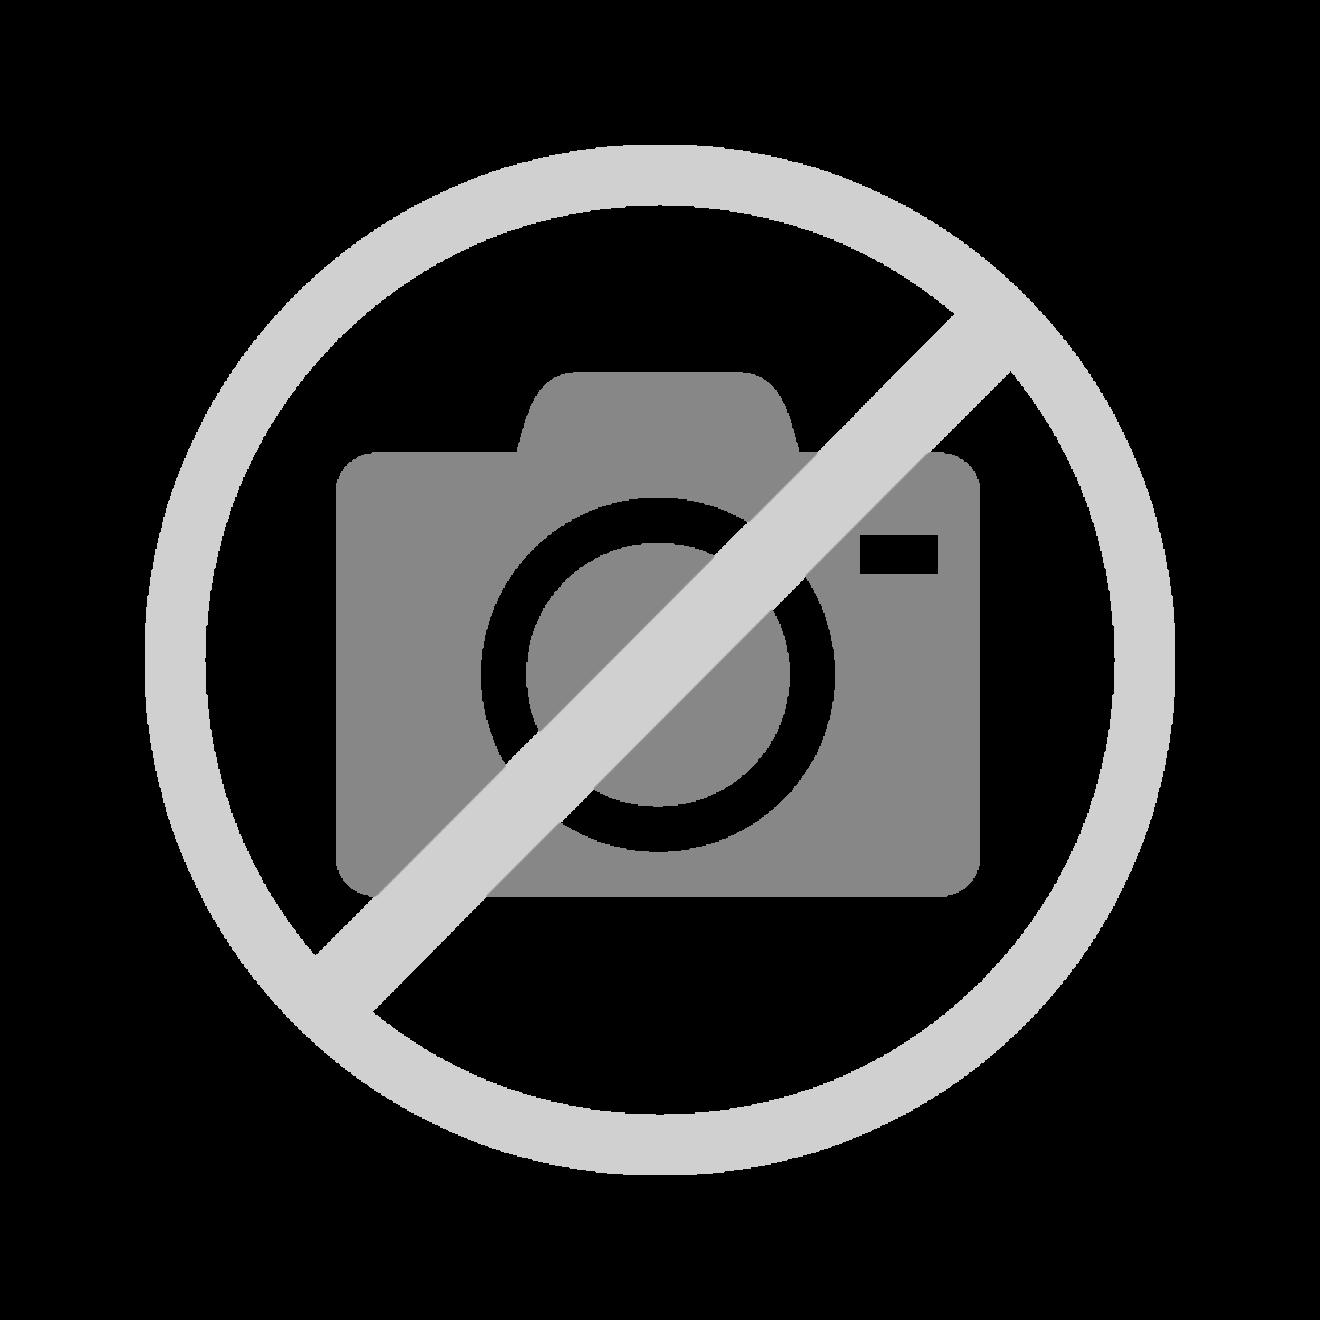 weihnachts berraschungsbox f r gro e hunde weihnachts berraschungsbox hunde. Black Bedroom Furniture Sets. Home Design Ideas